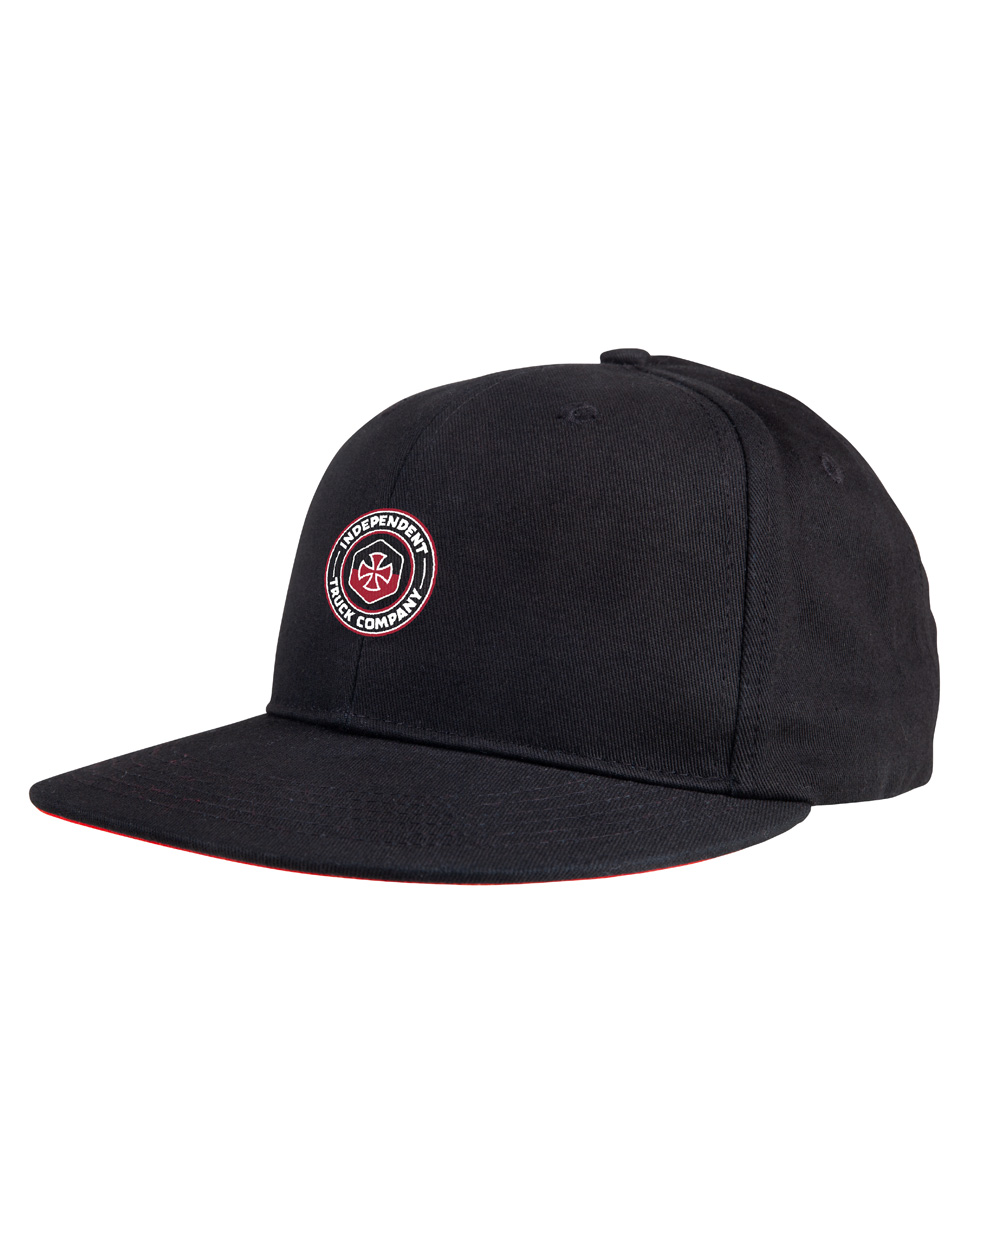 Independent Blockade Cappellino da Baseball 5 Pannelli Uomo Black